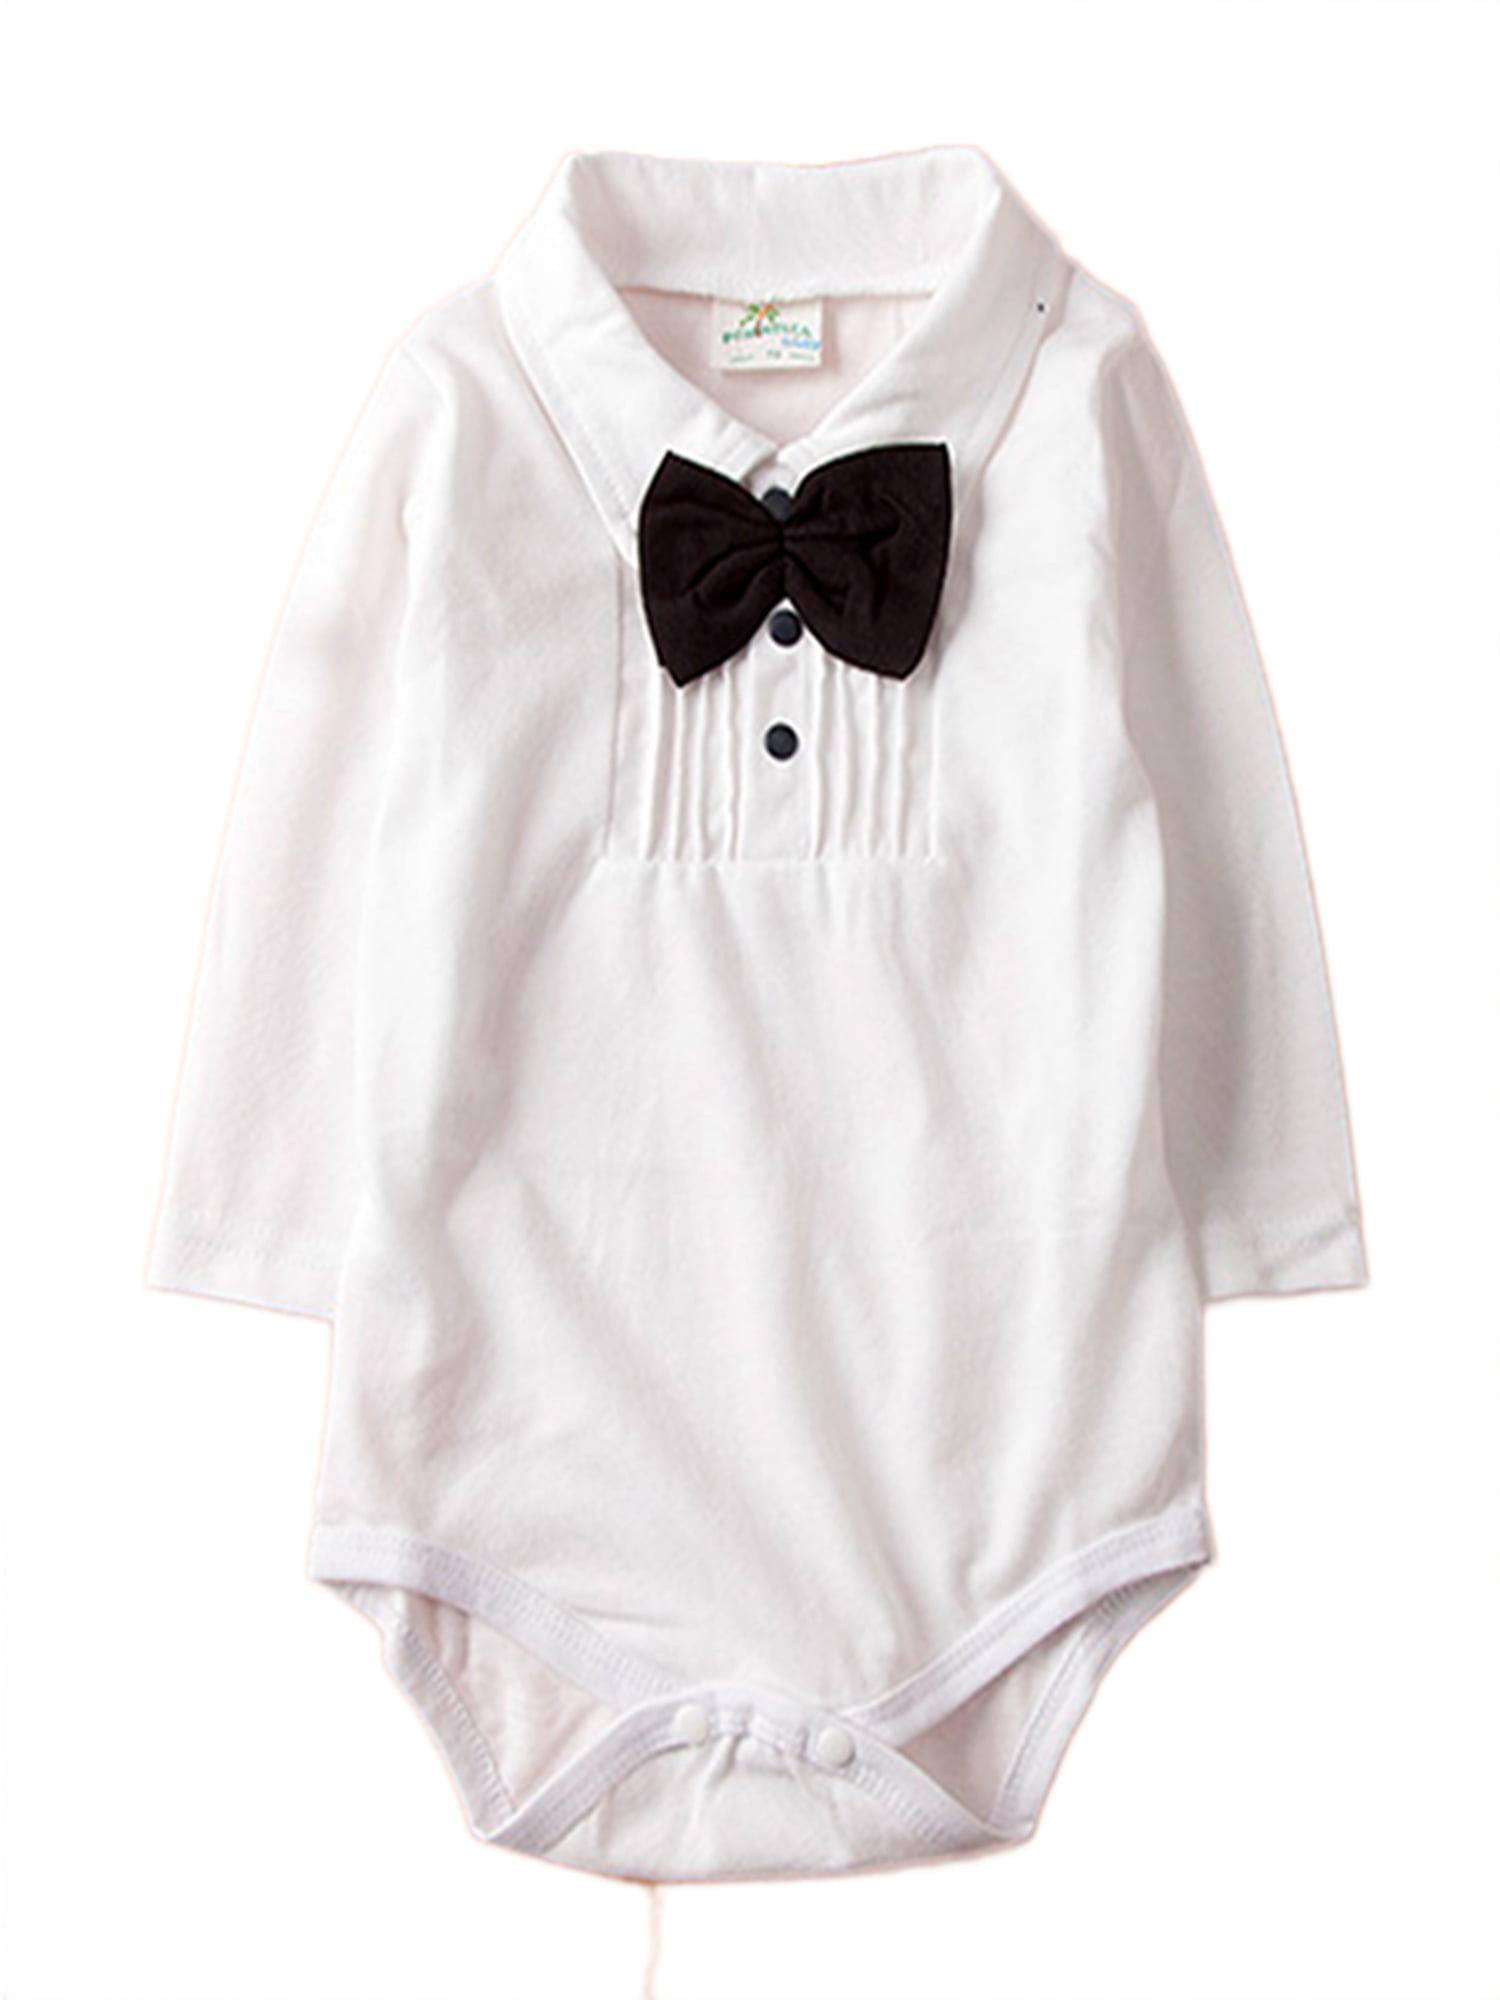 Stylesilove Long Sleeve Tuxedo Shirt Baby Boy Jumpsuit (3-6 Months, Navy Blue)